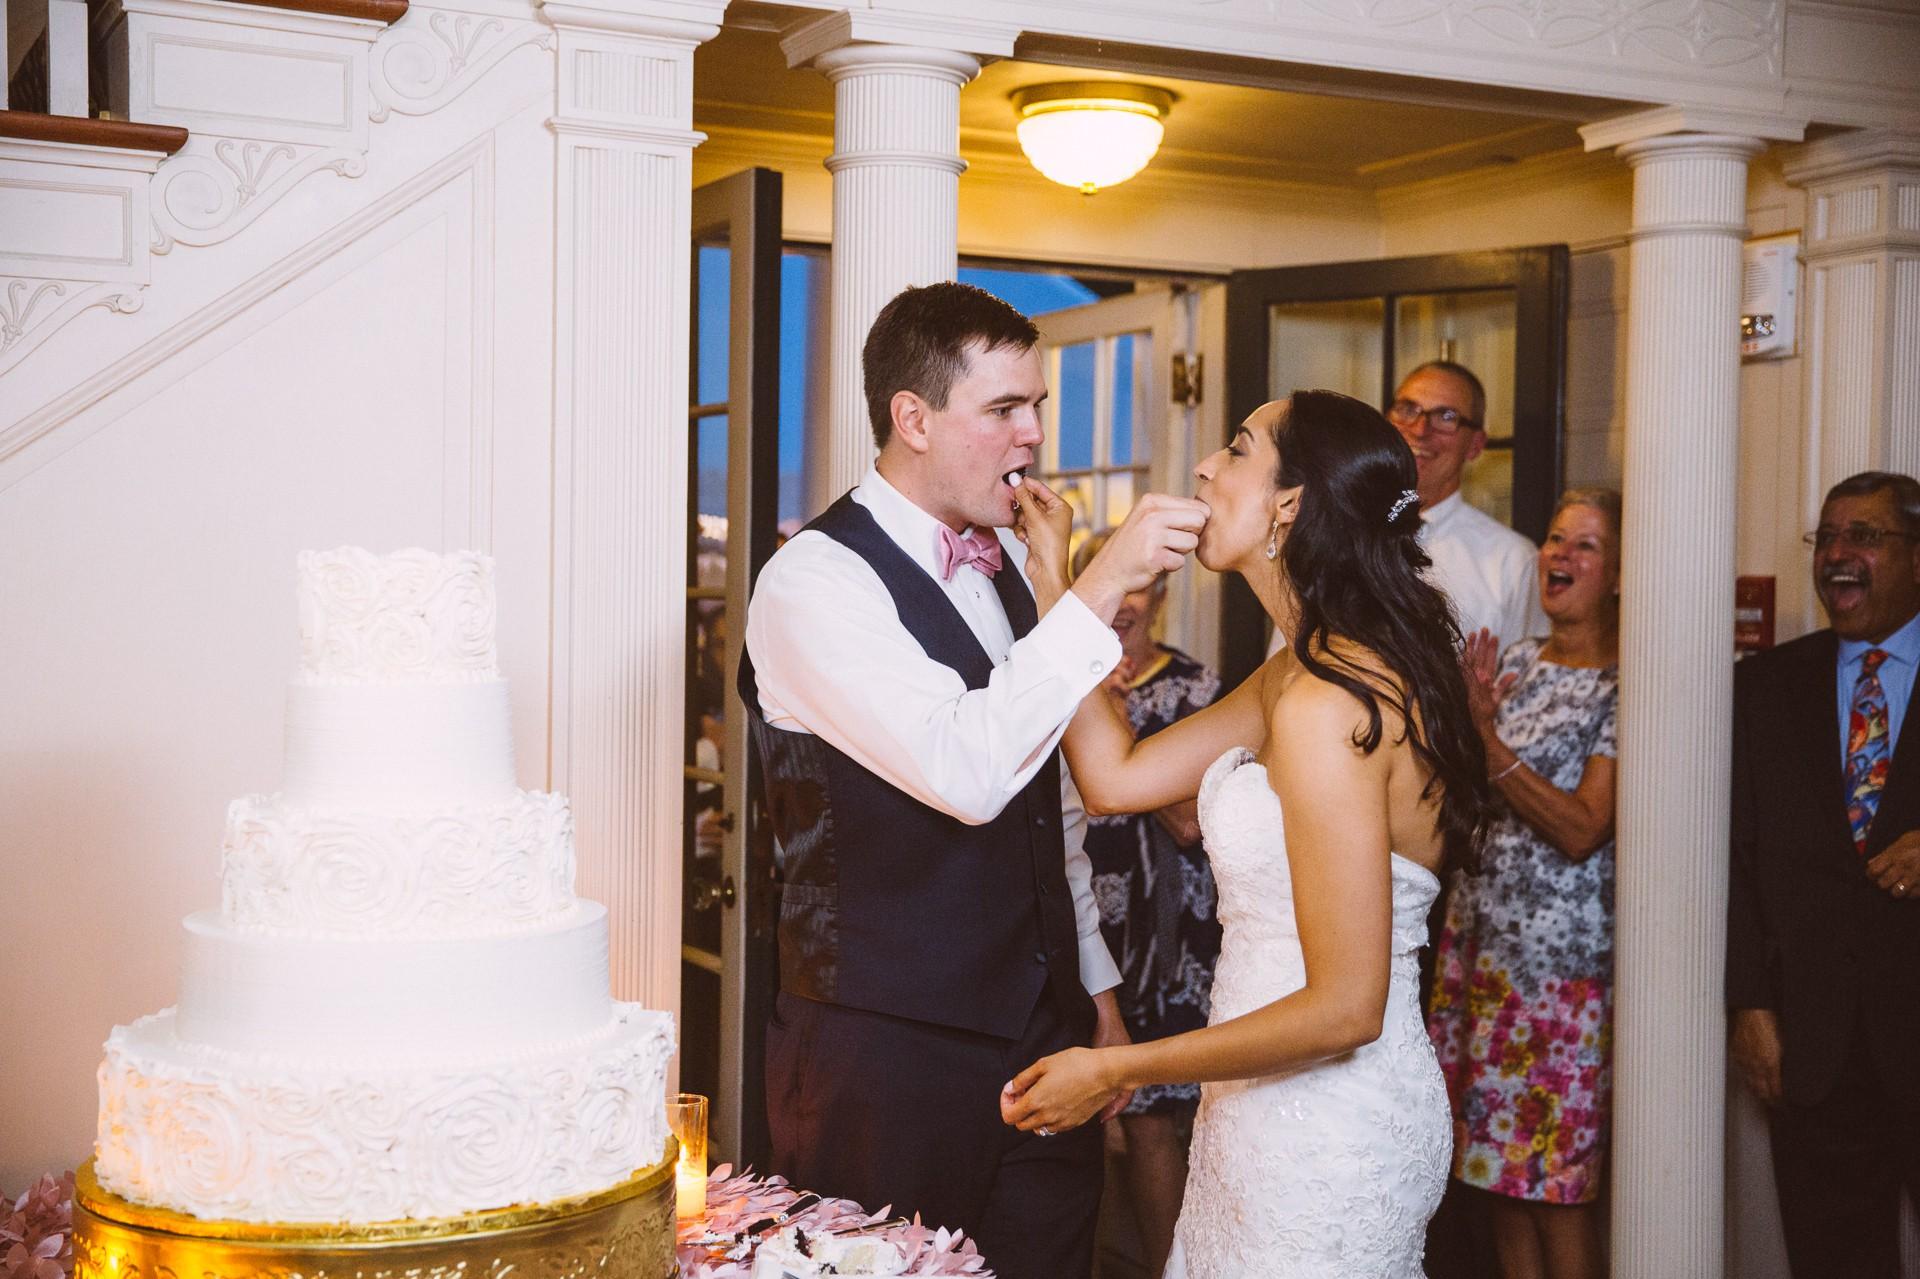 Bolton House Wedding Photographer in Beachwood 76.jpg